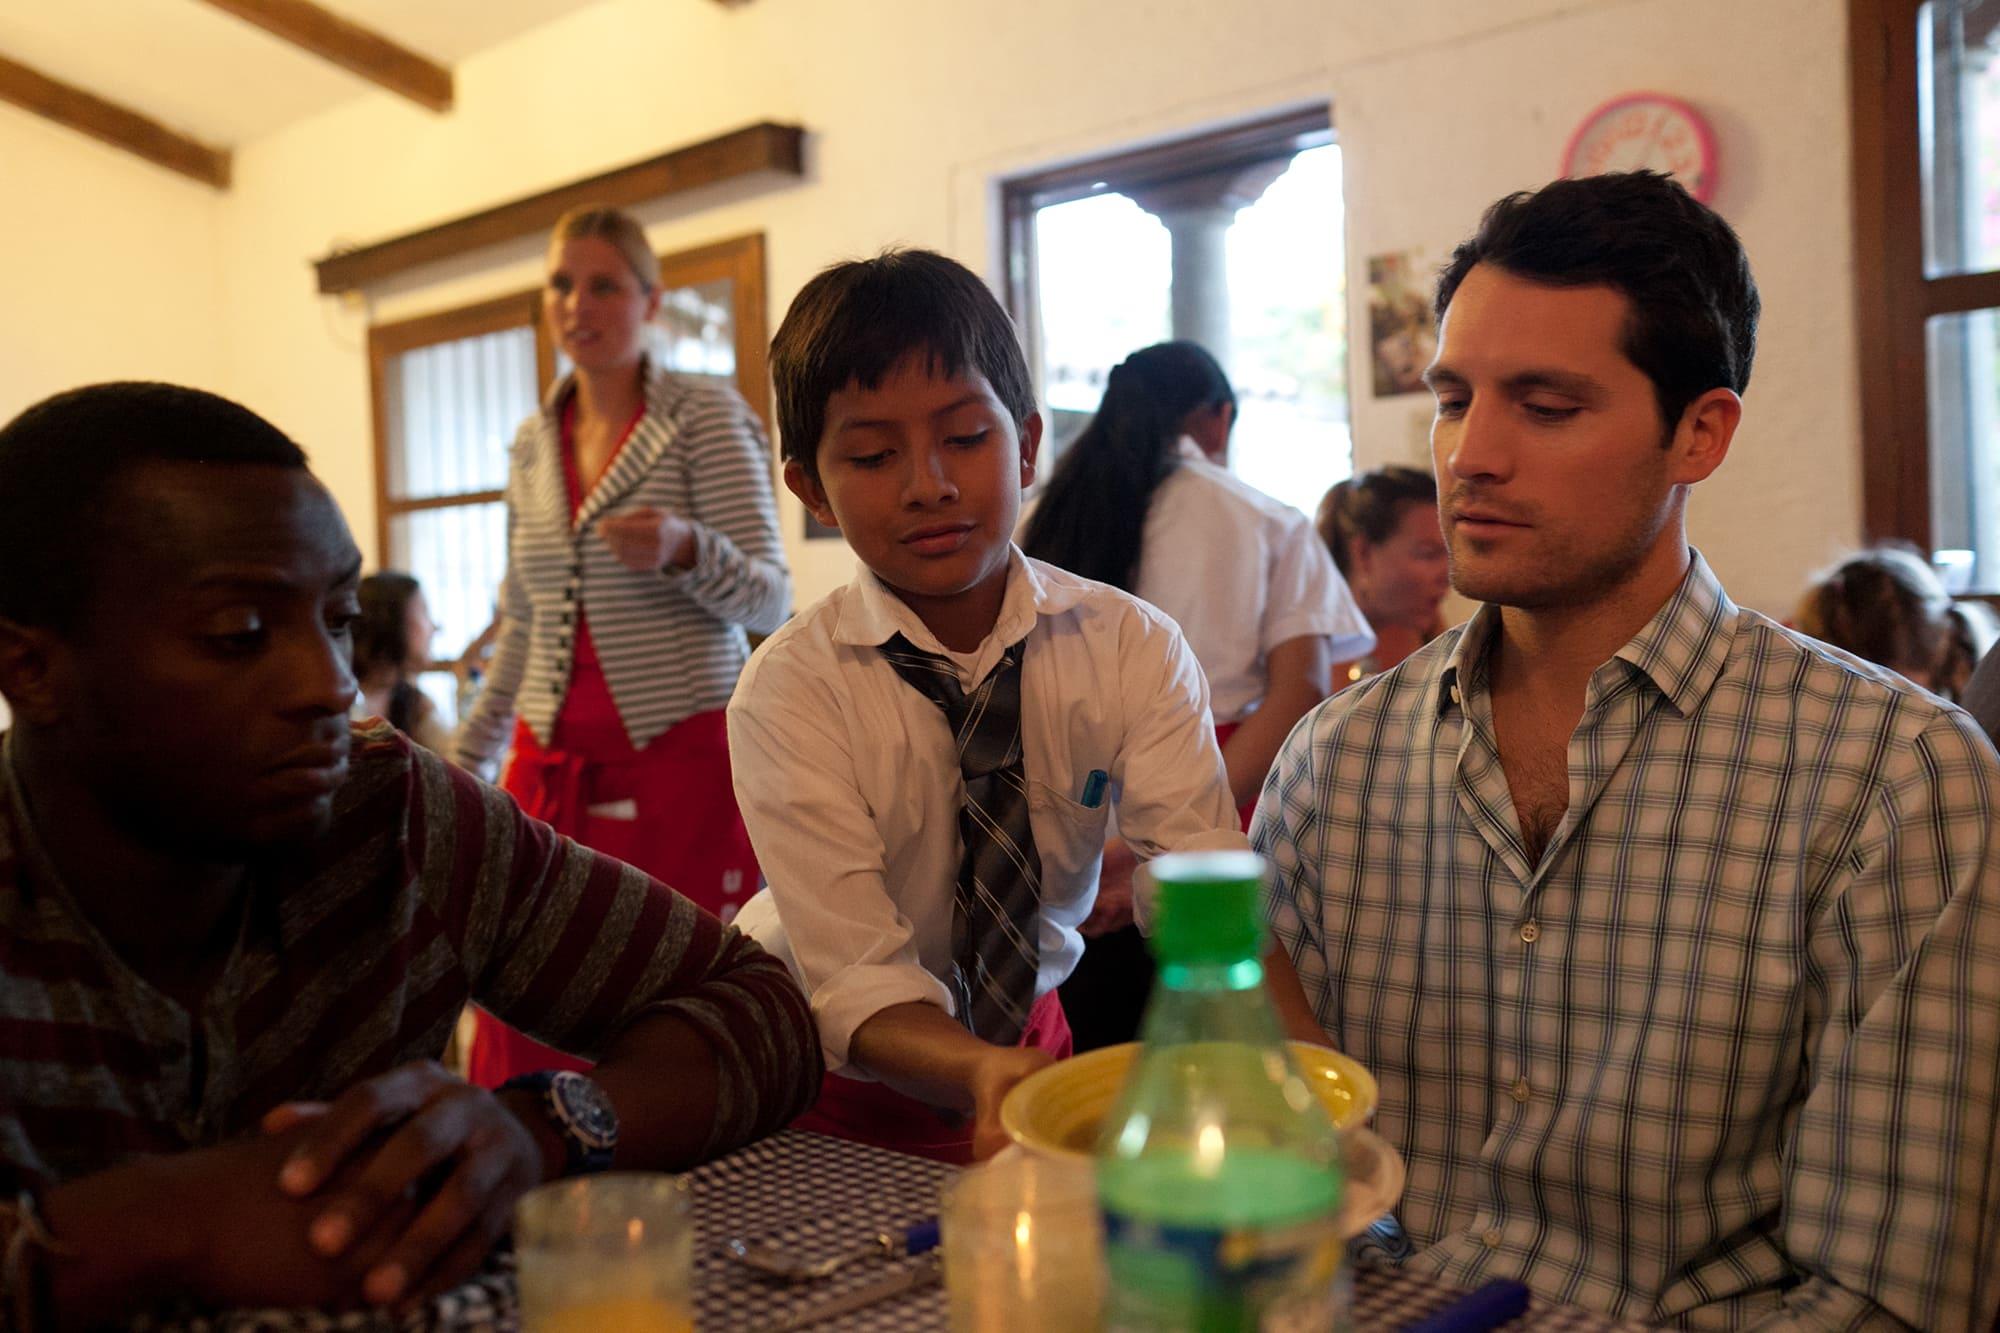 KIDS Restaurant in Antigua, Guatemala